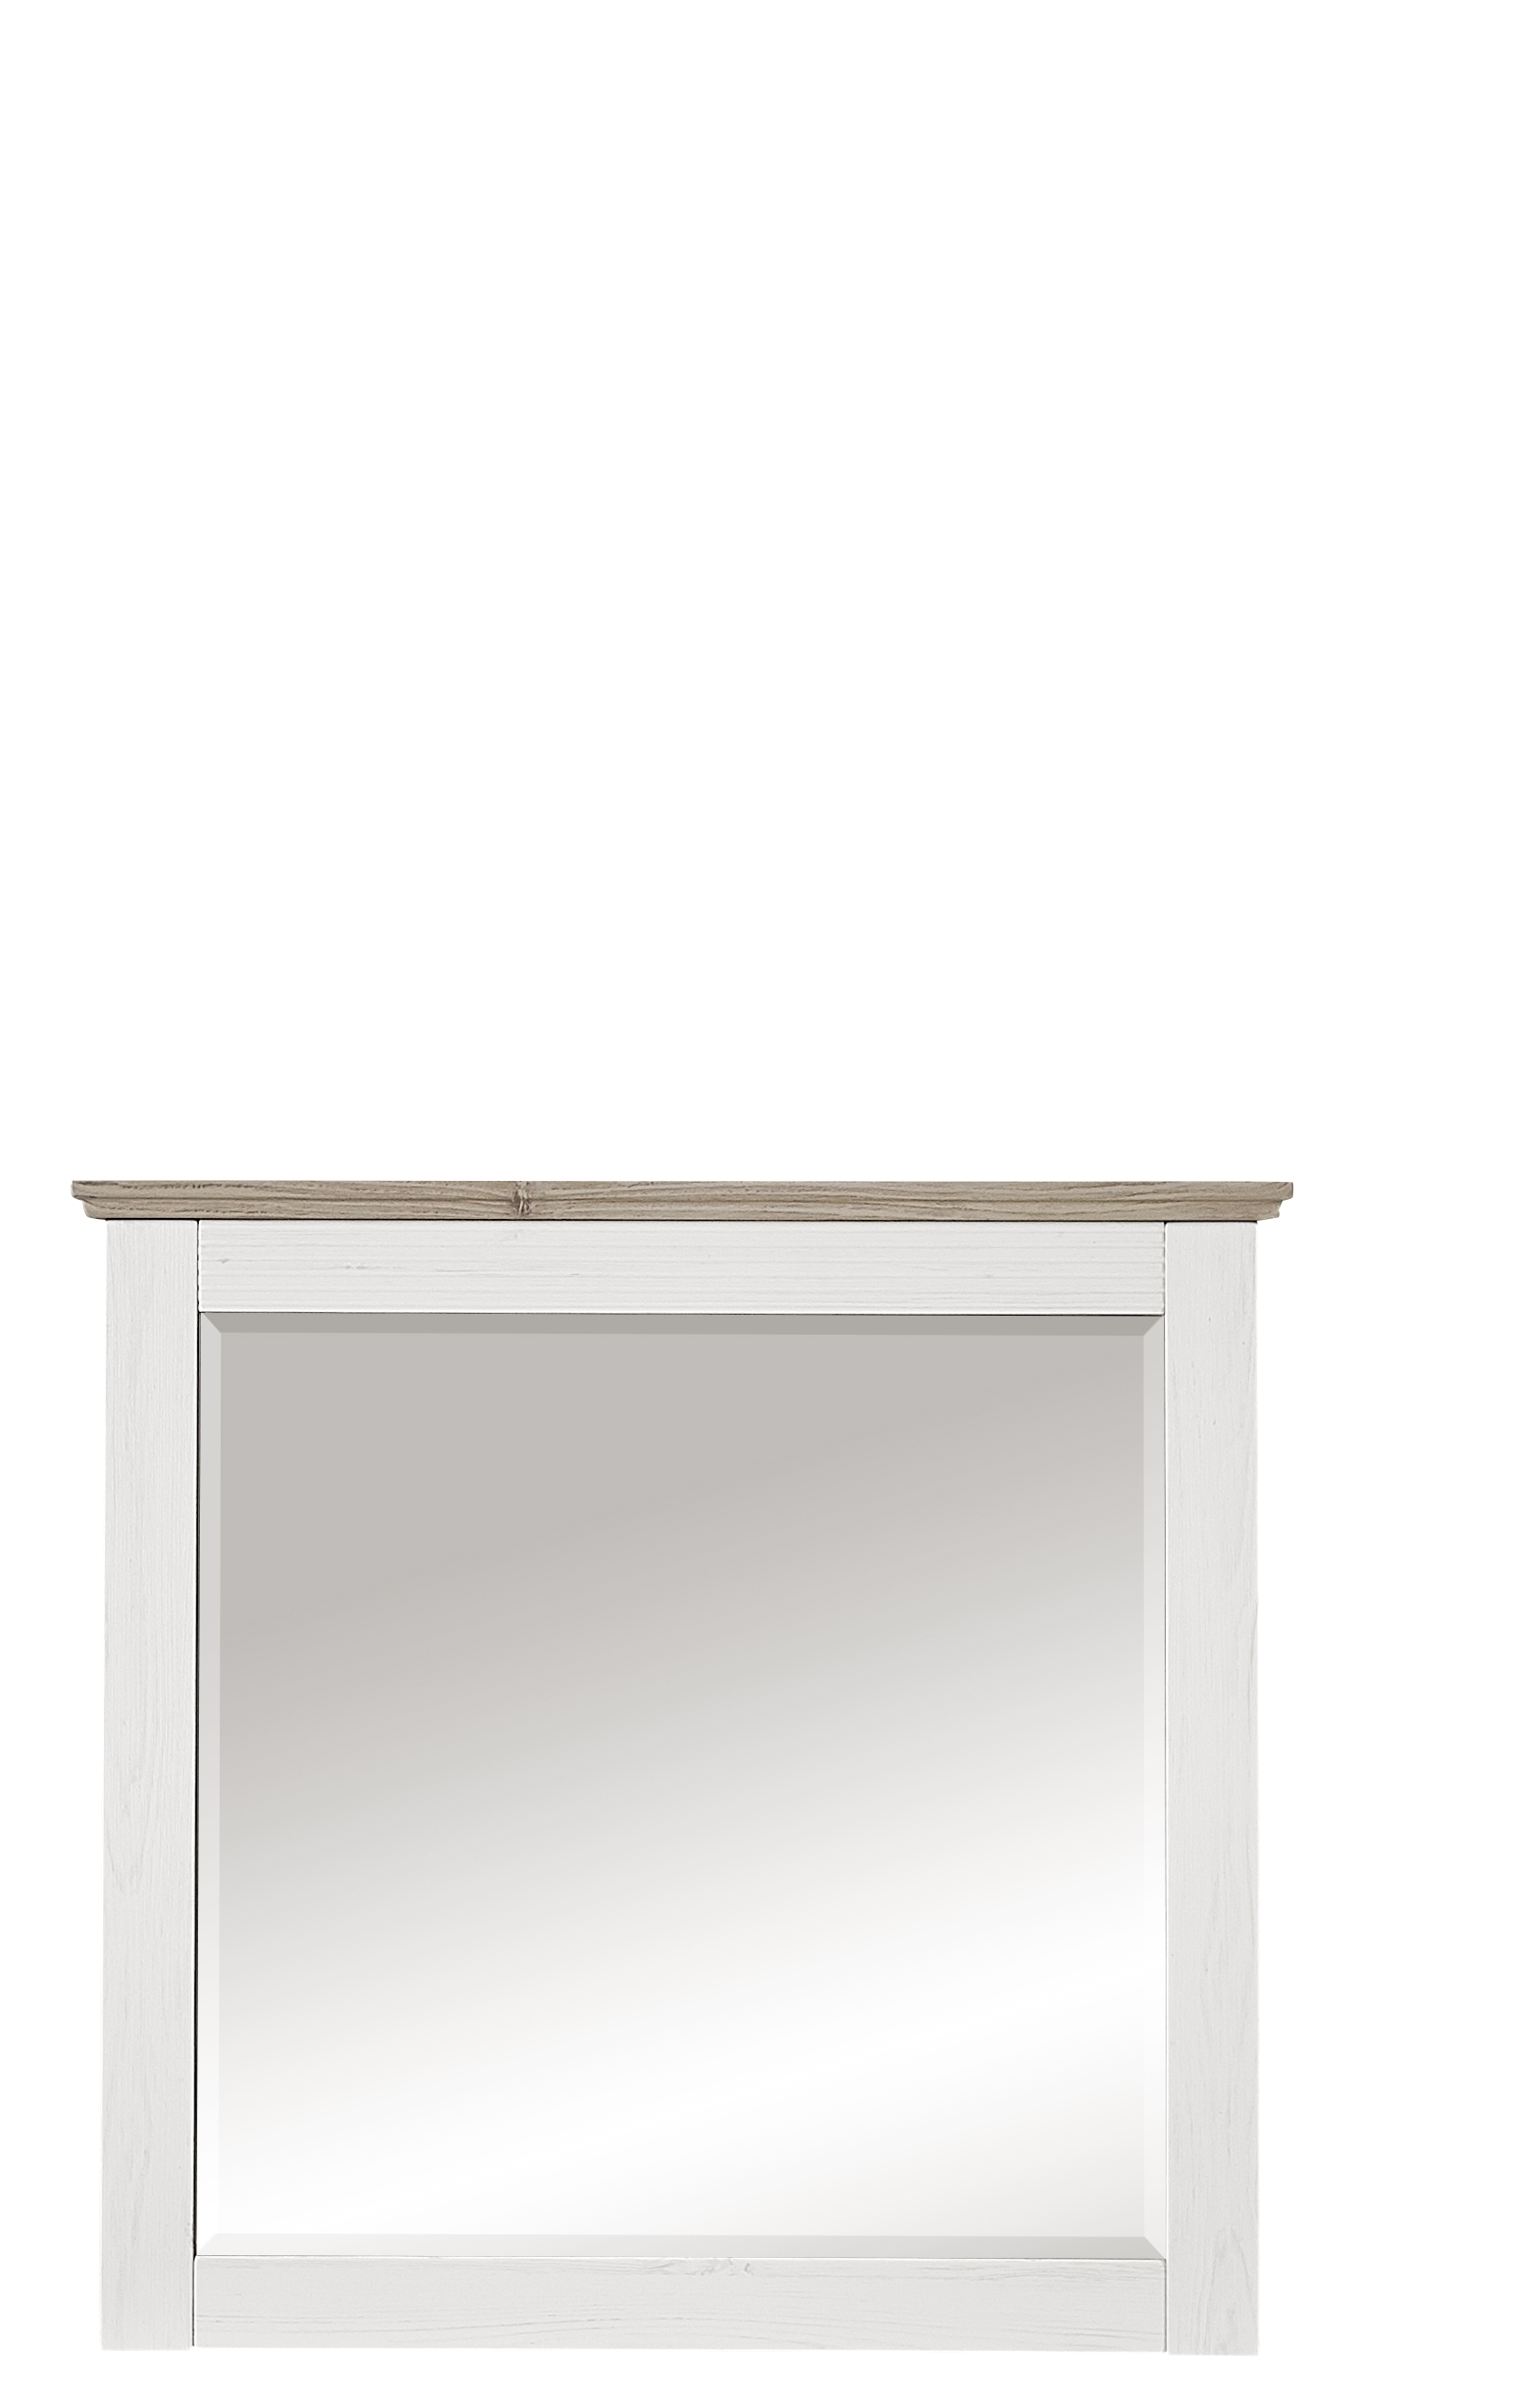 Oglinda din pal si MDF, Victory Alb, 89 x 85 cm imagine